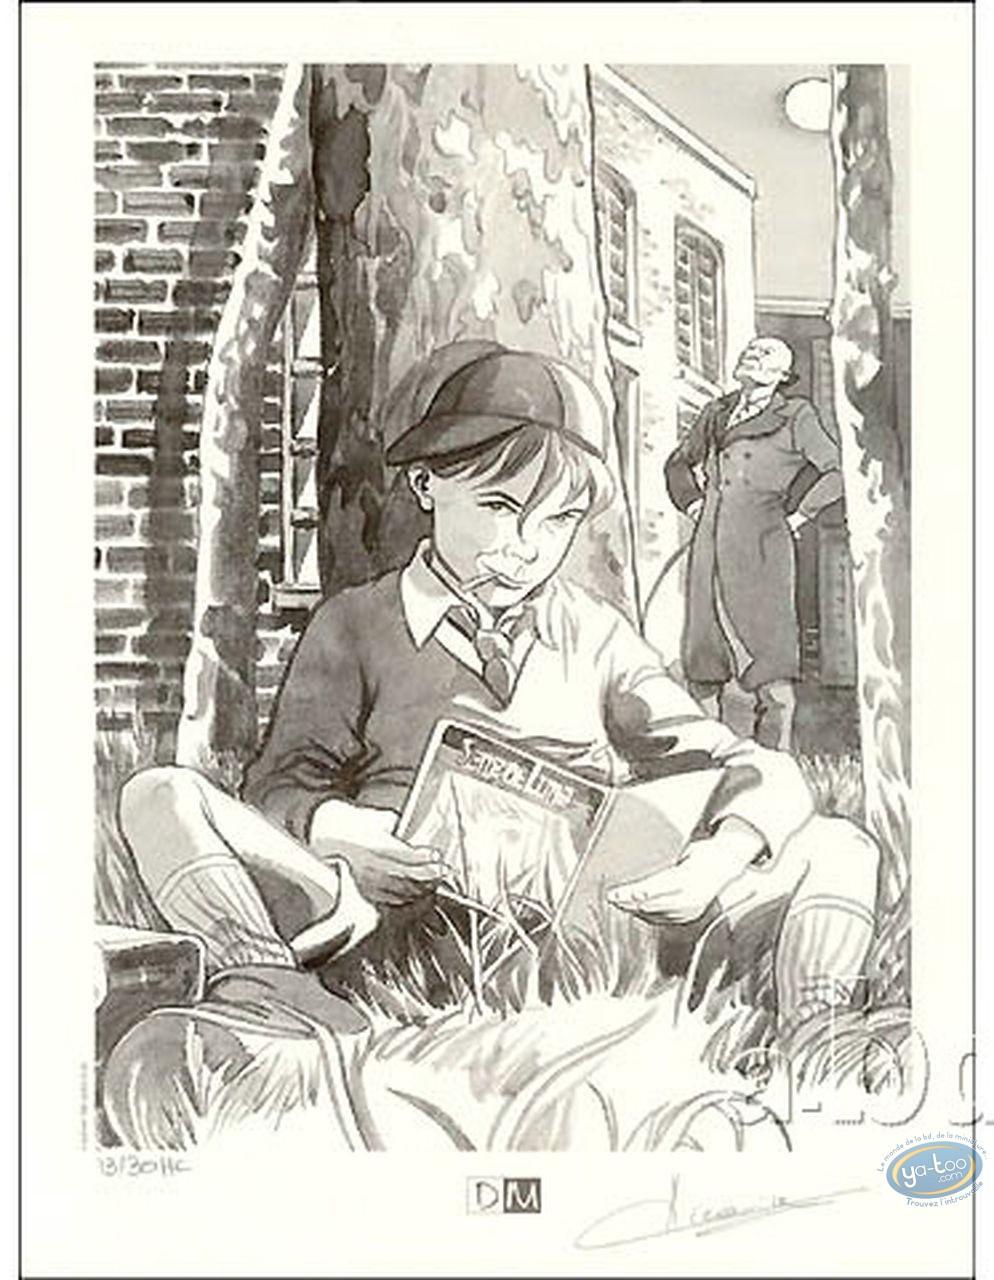 Bookplate Offset, Sang de Lune : Boy Reading